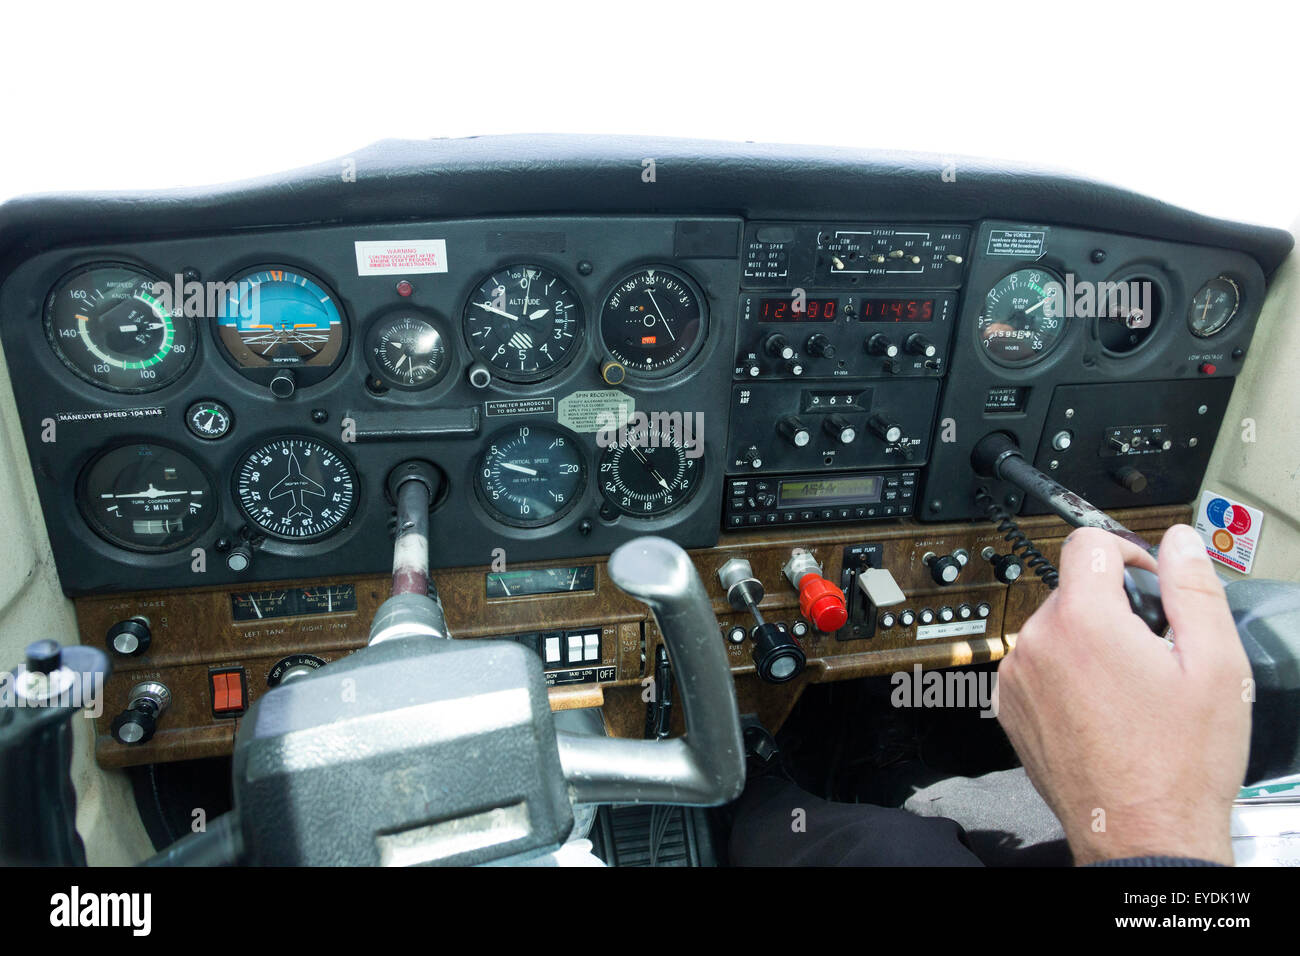 cessna 172 dashboard diagram freightliner jake brake wiring cockpit instrument panel of a 152 light aircraft